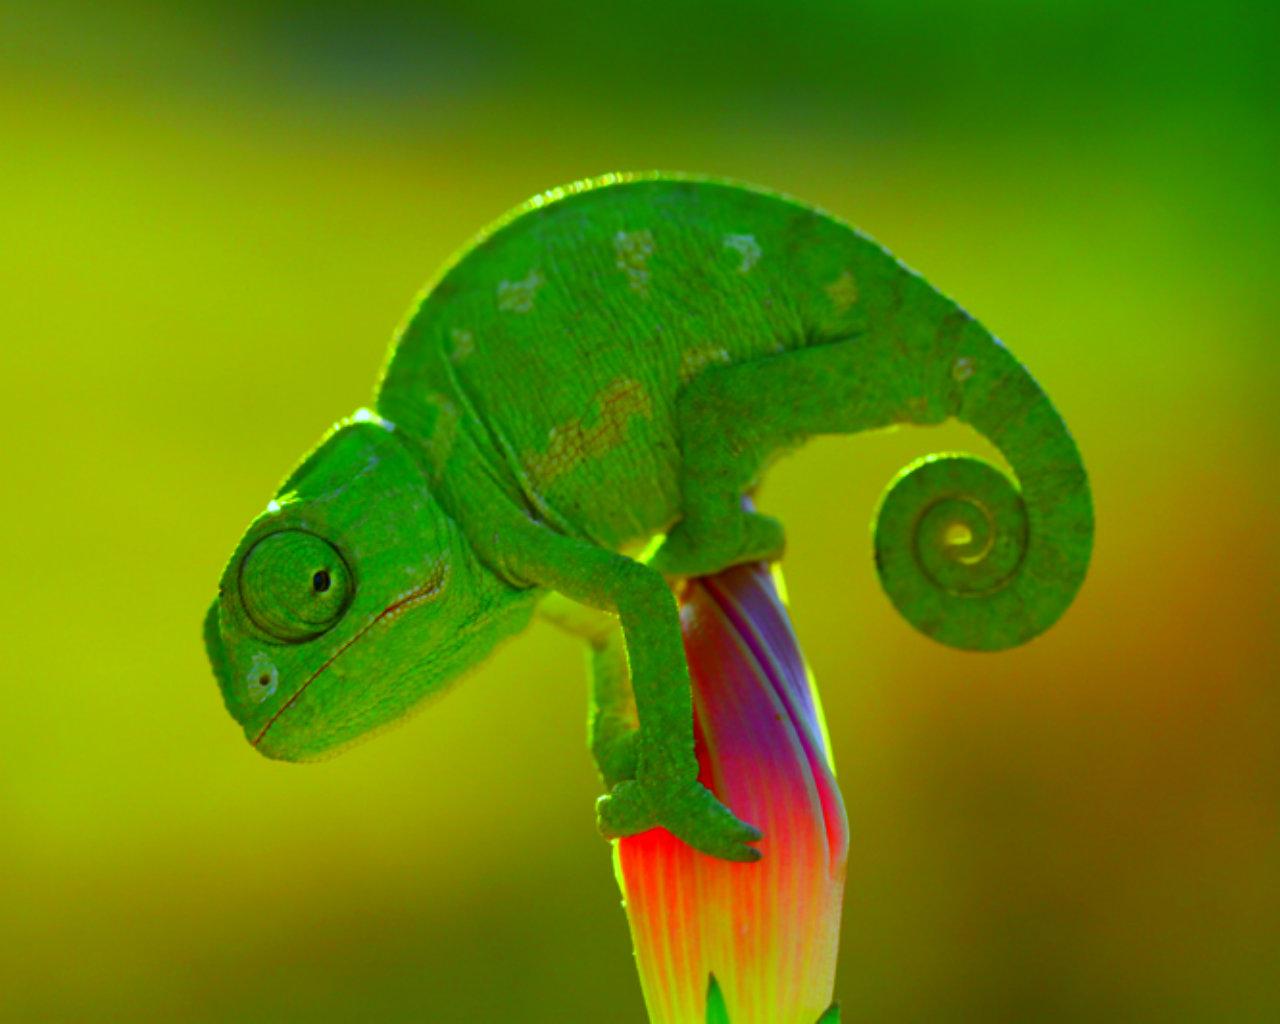 Cameleon - Animals Photo (35230450) - Fanpop